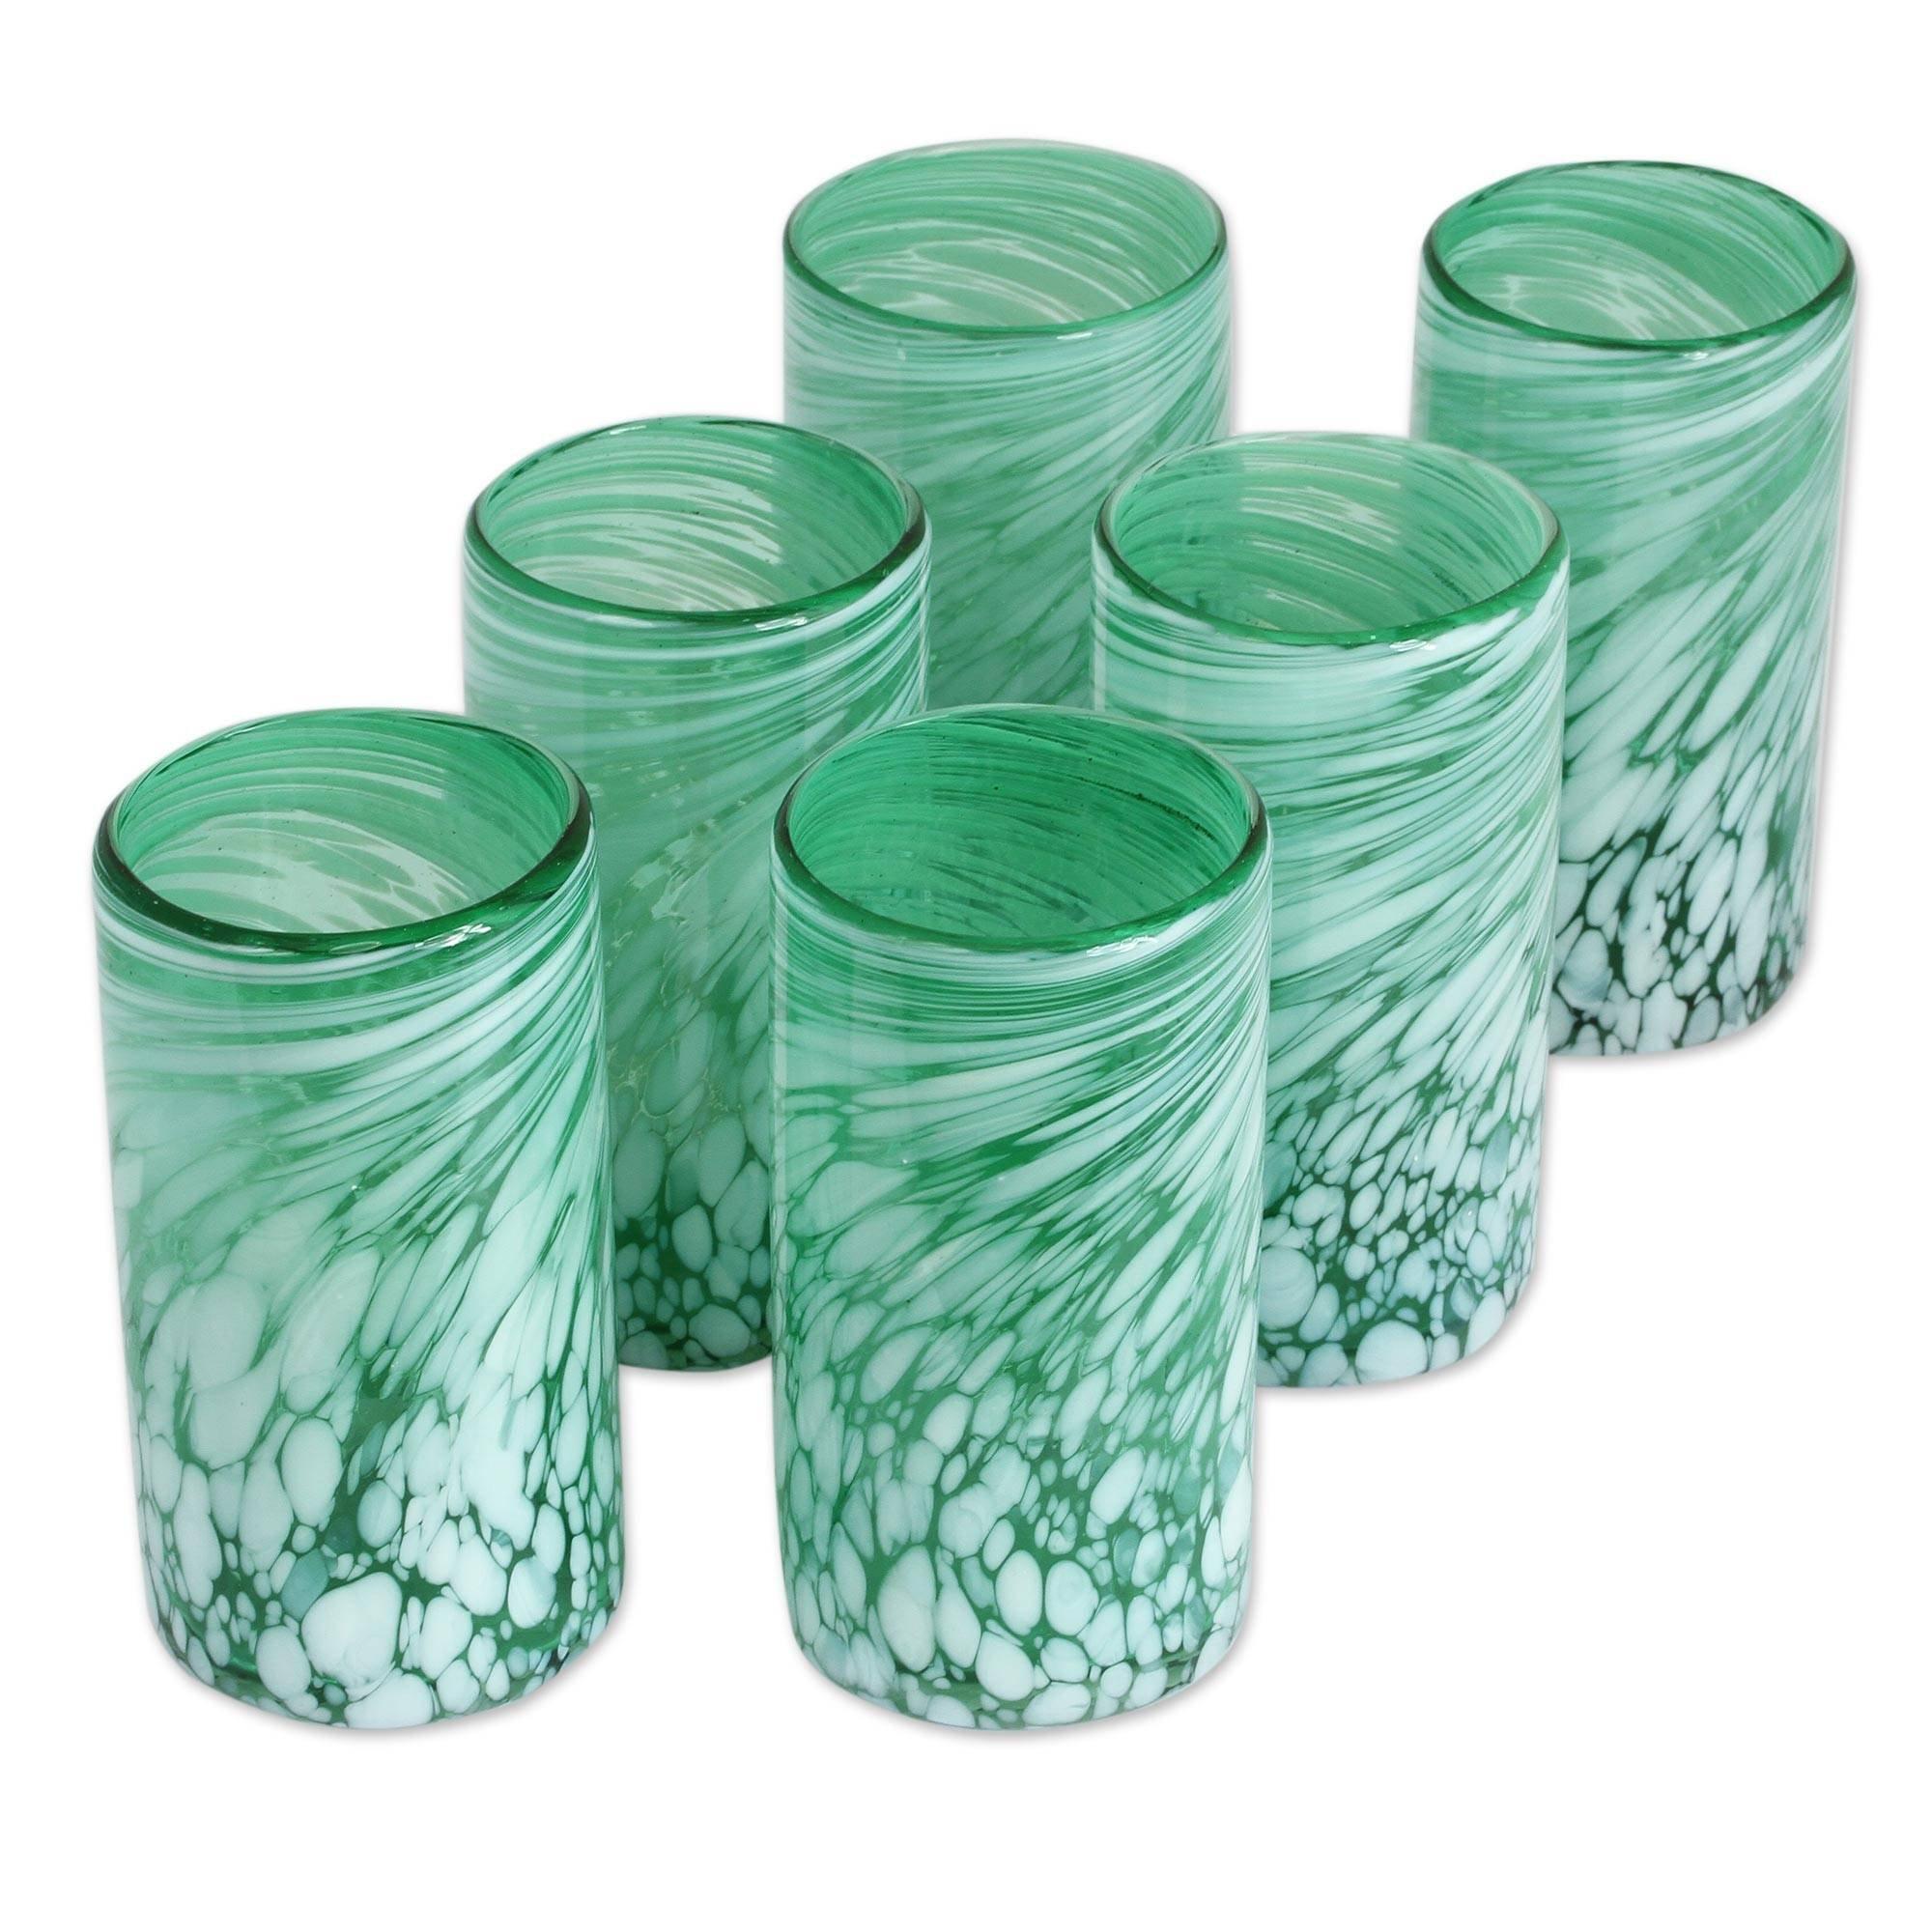 NOVICA Hand Blown Glass Eco-Friendly Green Drinking Glasses, 16 oz, 'Festive Green' (set of 6)